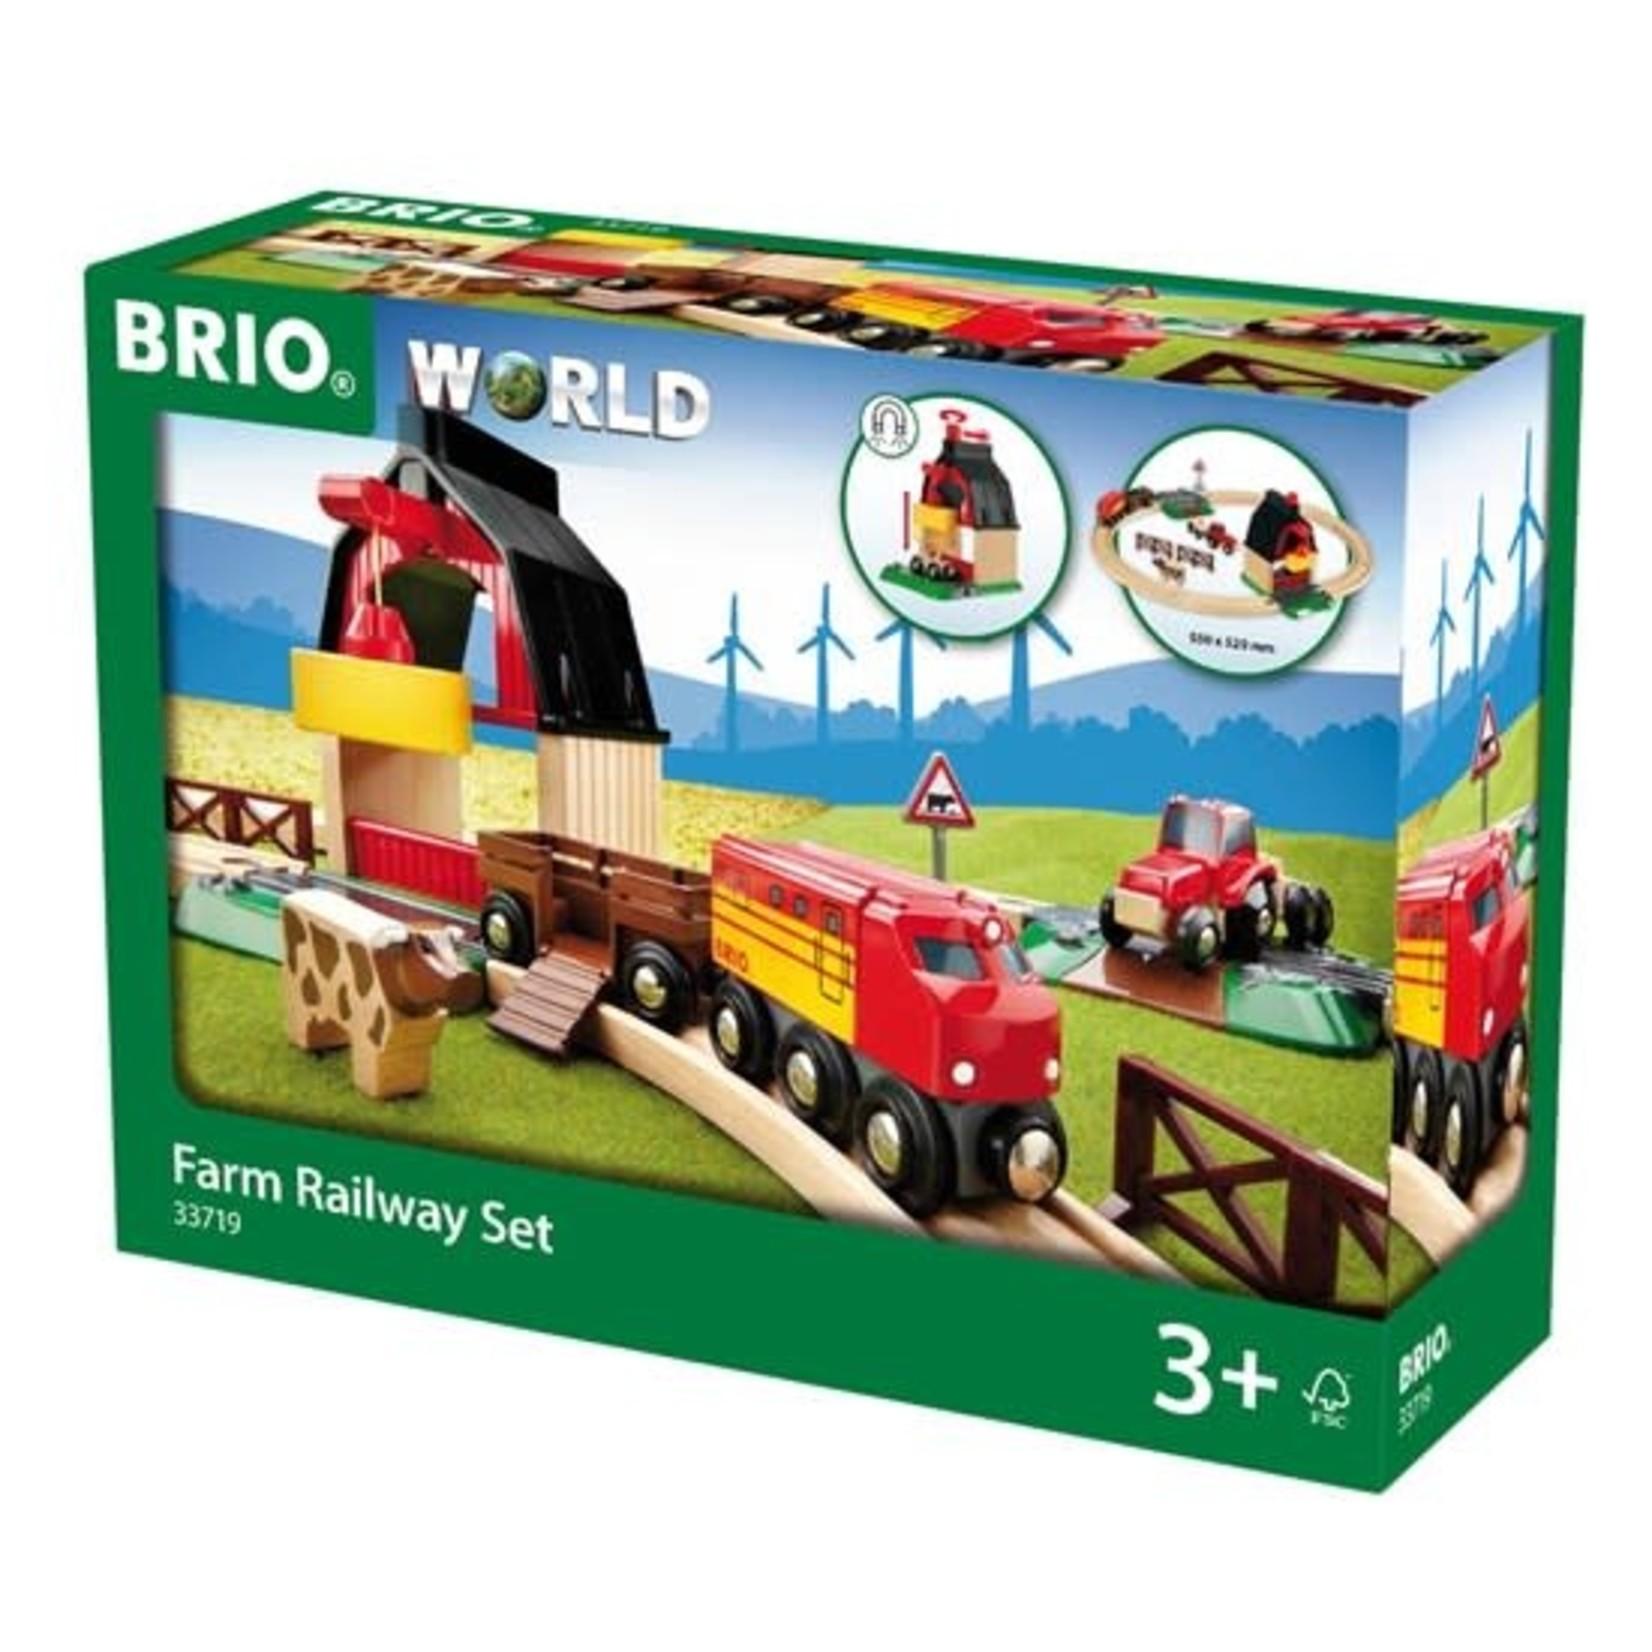 BRIO 33719 FARM RAILWAY SET